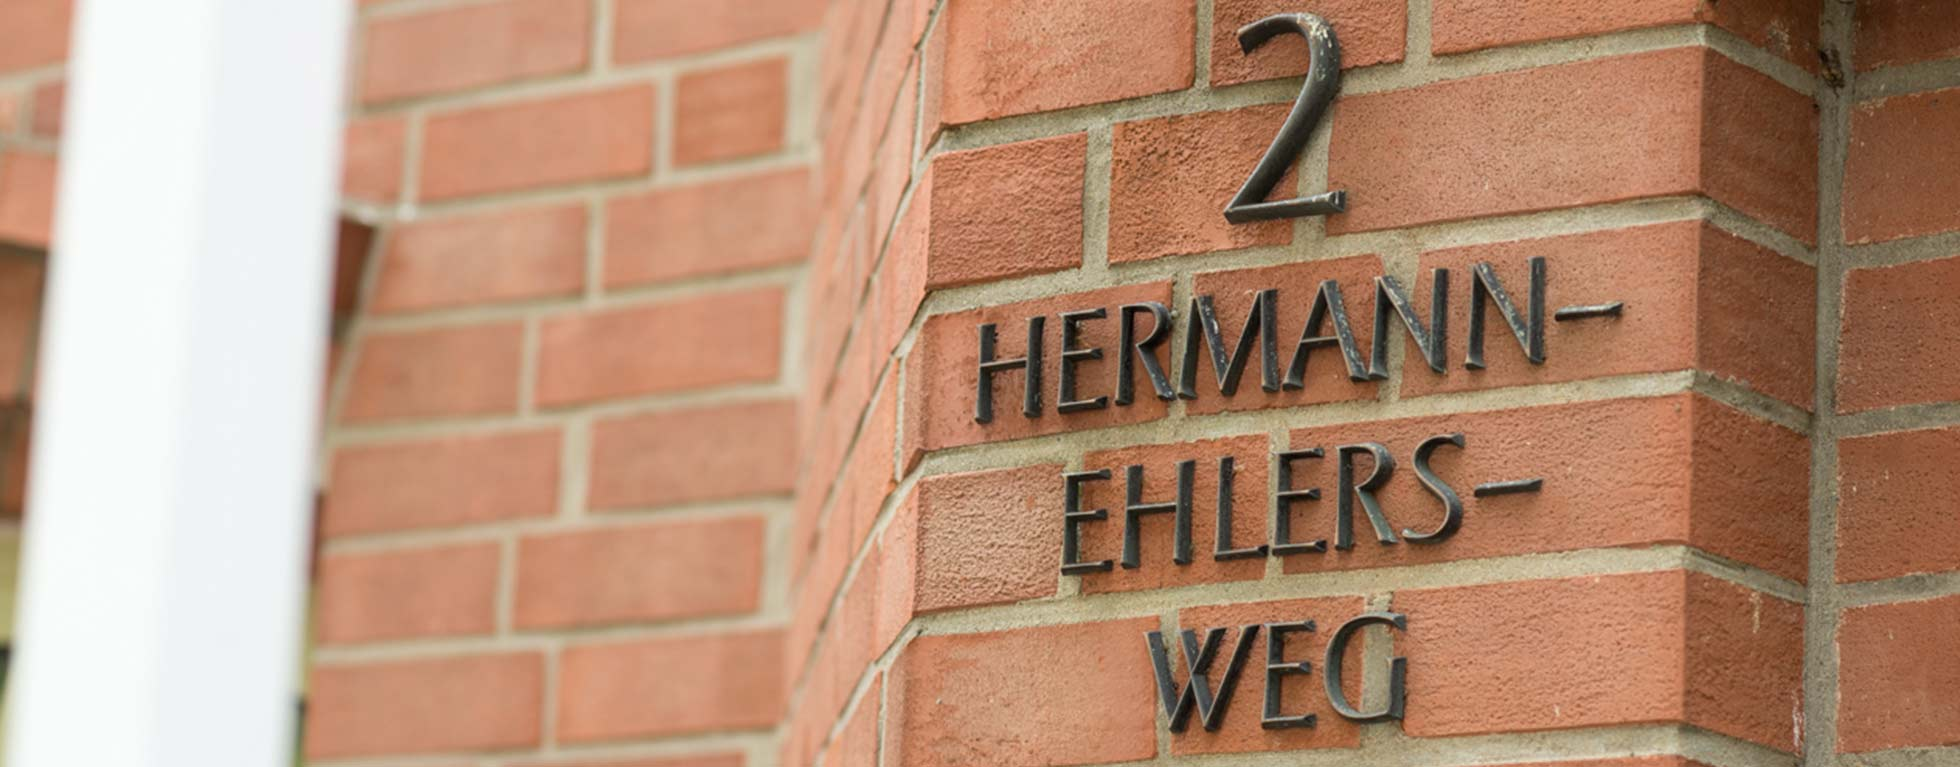 Hauschildt Mohrdiek Steuerberater Elmshorn Herrmann-Ehlers-Weg 2